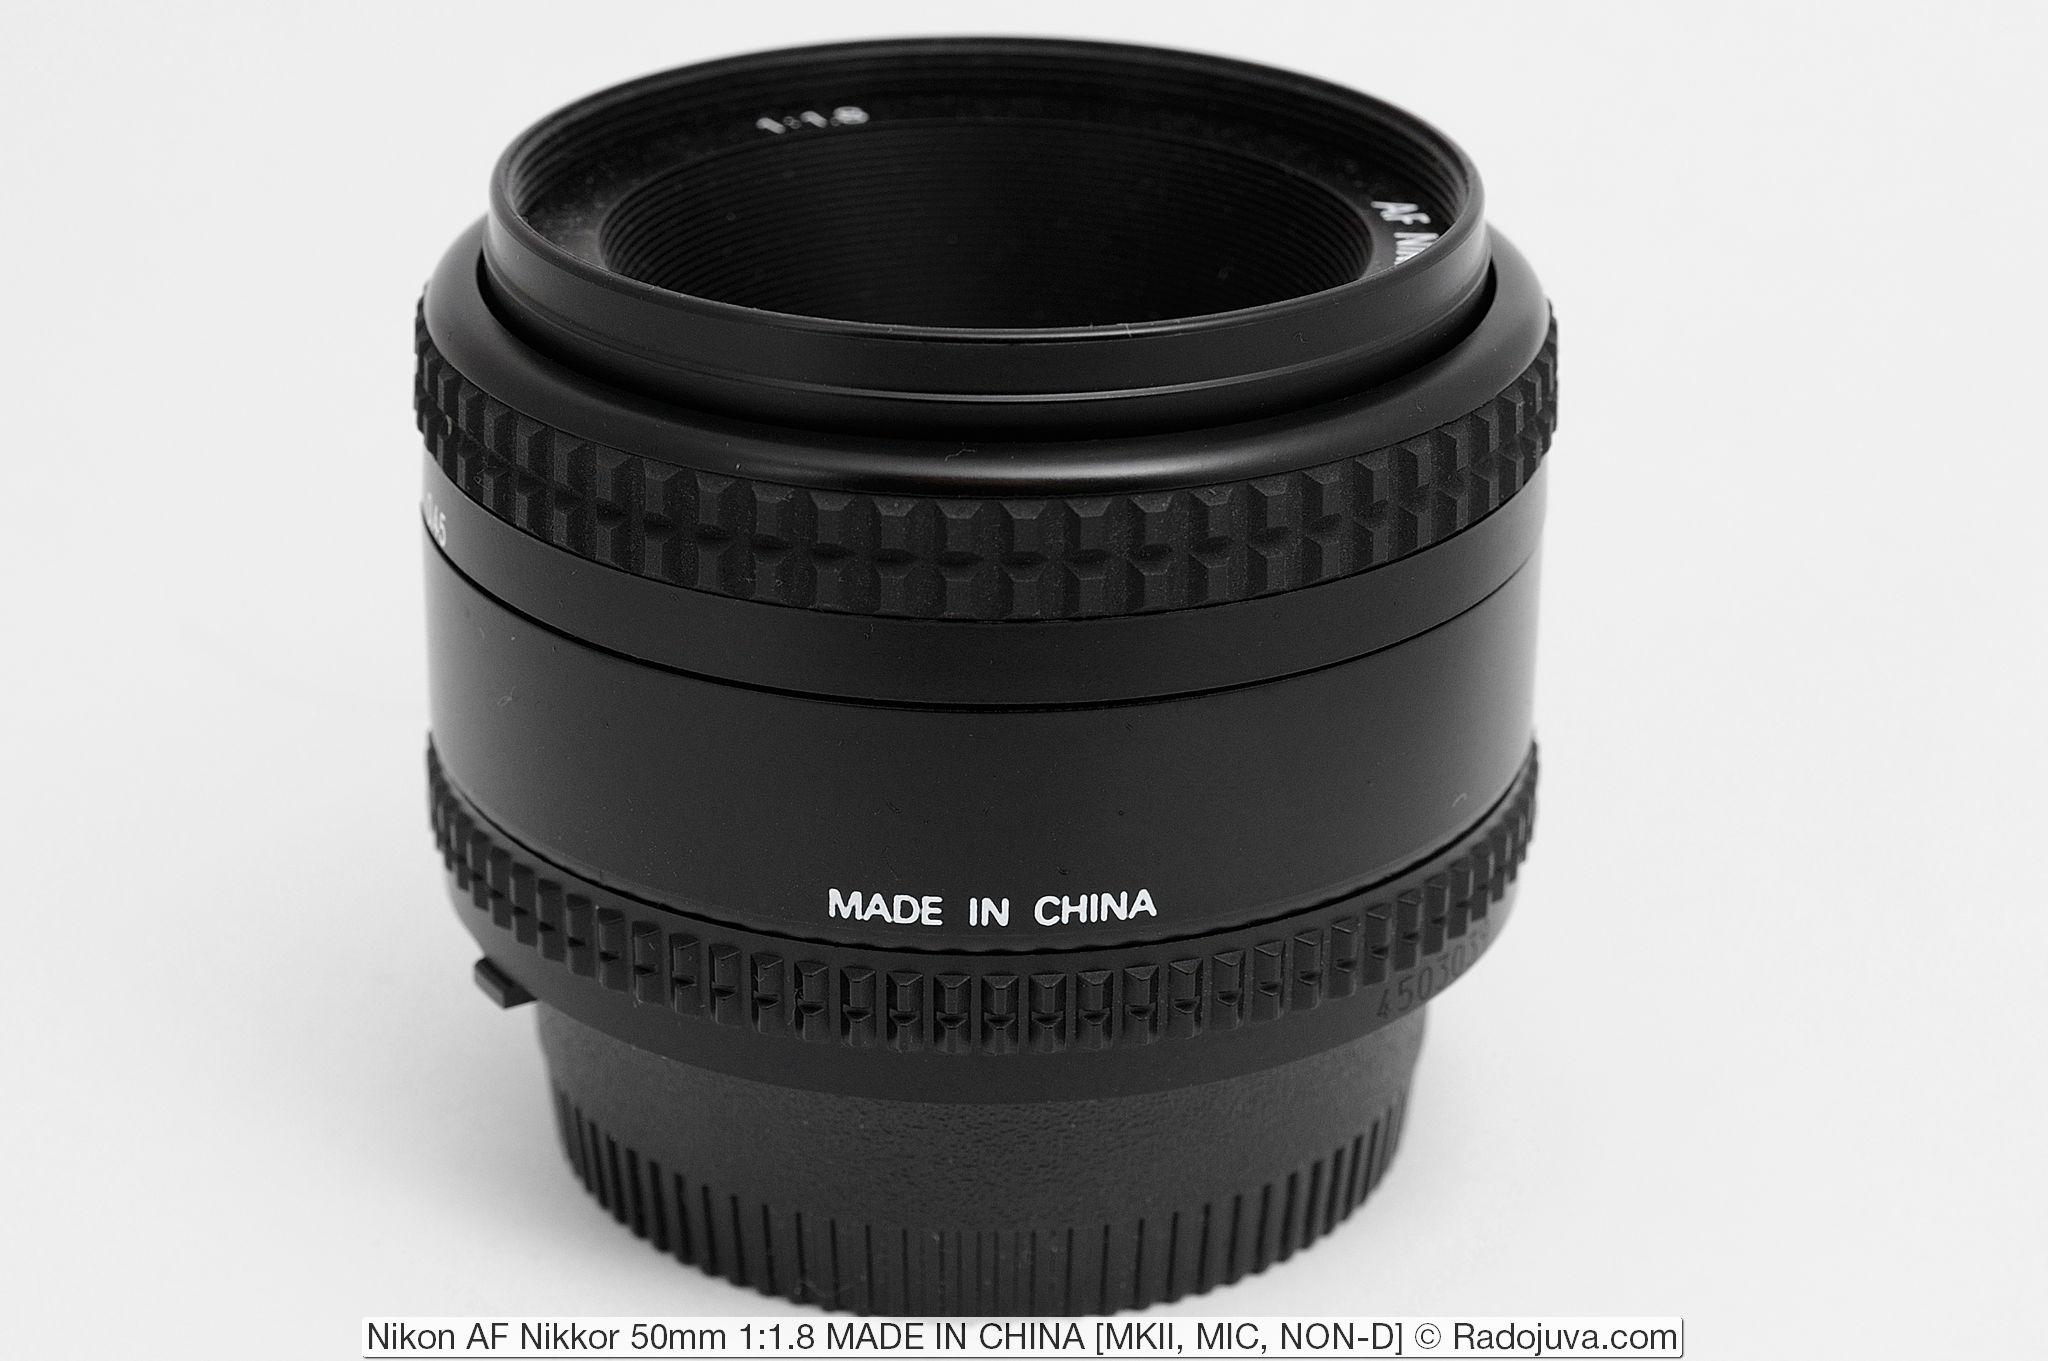 Nikon AF Nikkor 50mm 1:1.8, версия MKII, MIC (MADE IN CHINA)